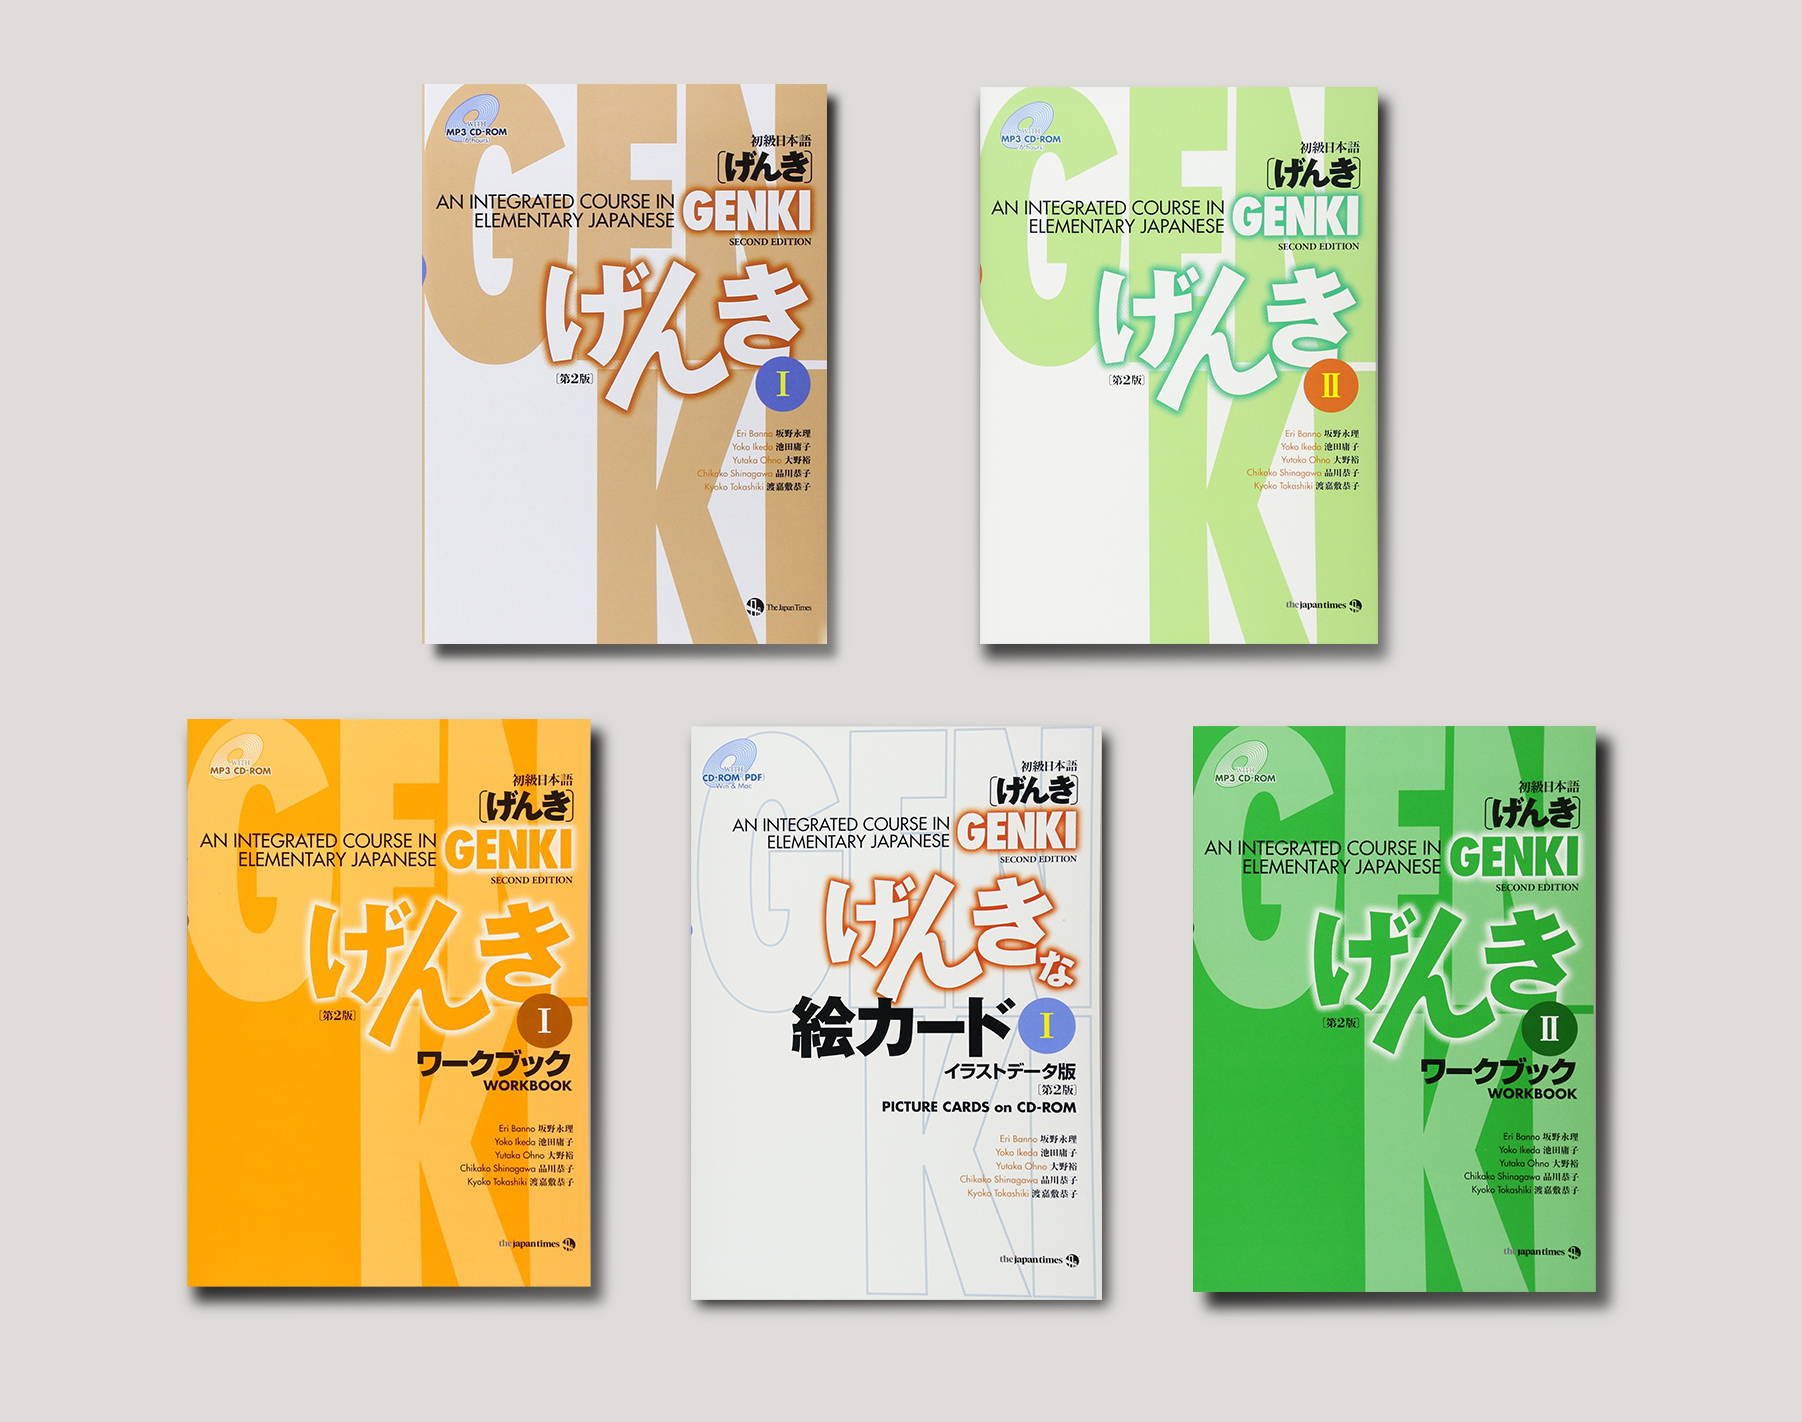 Genki japanese language books.